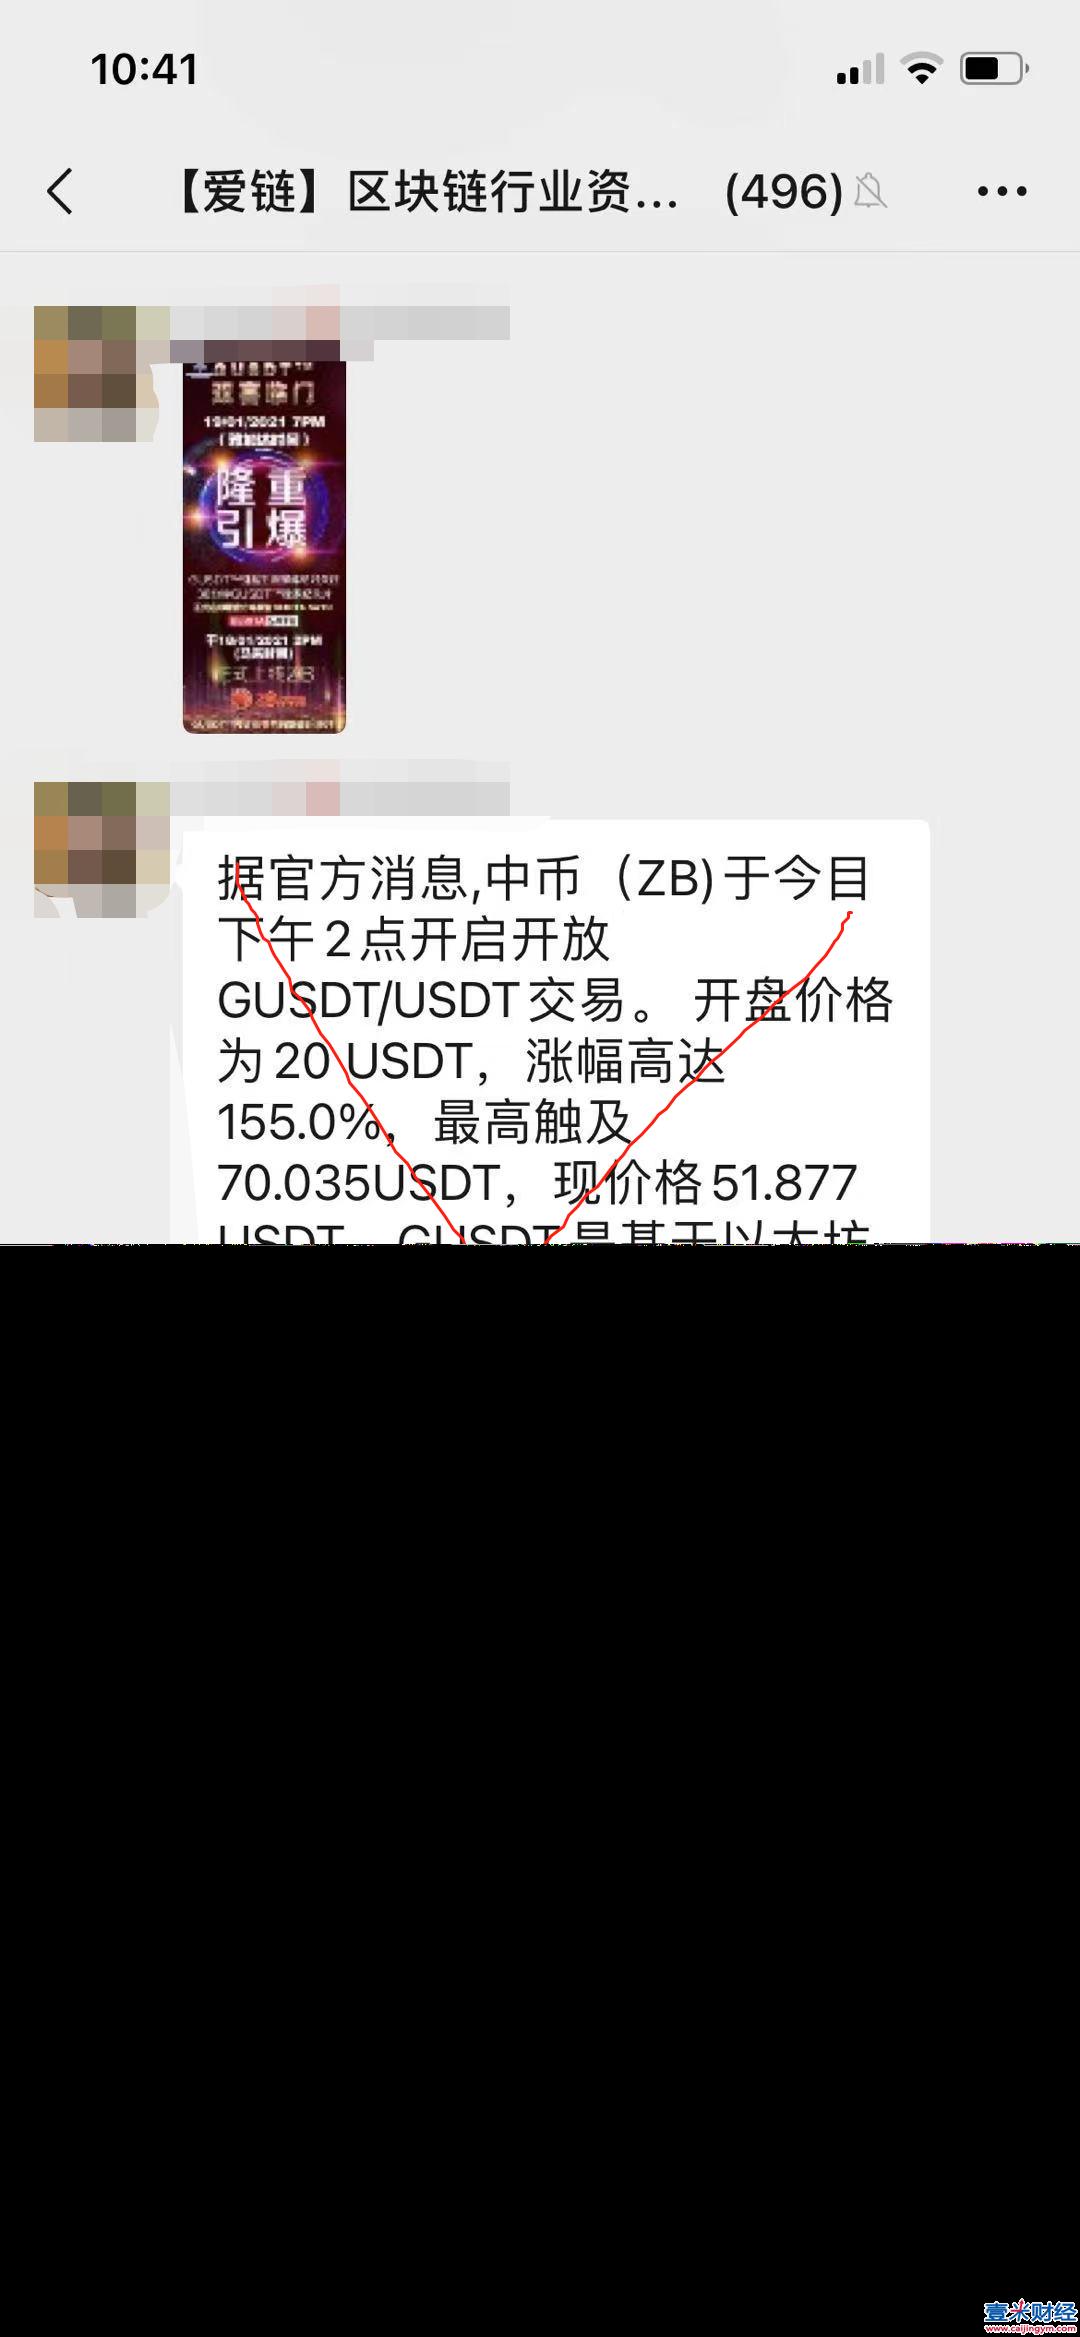 %title图%num